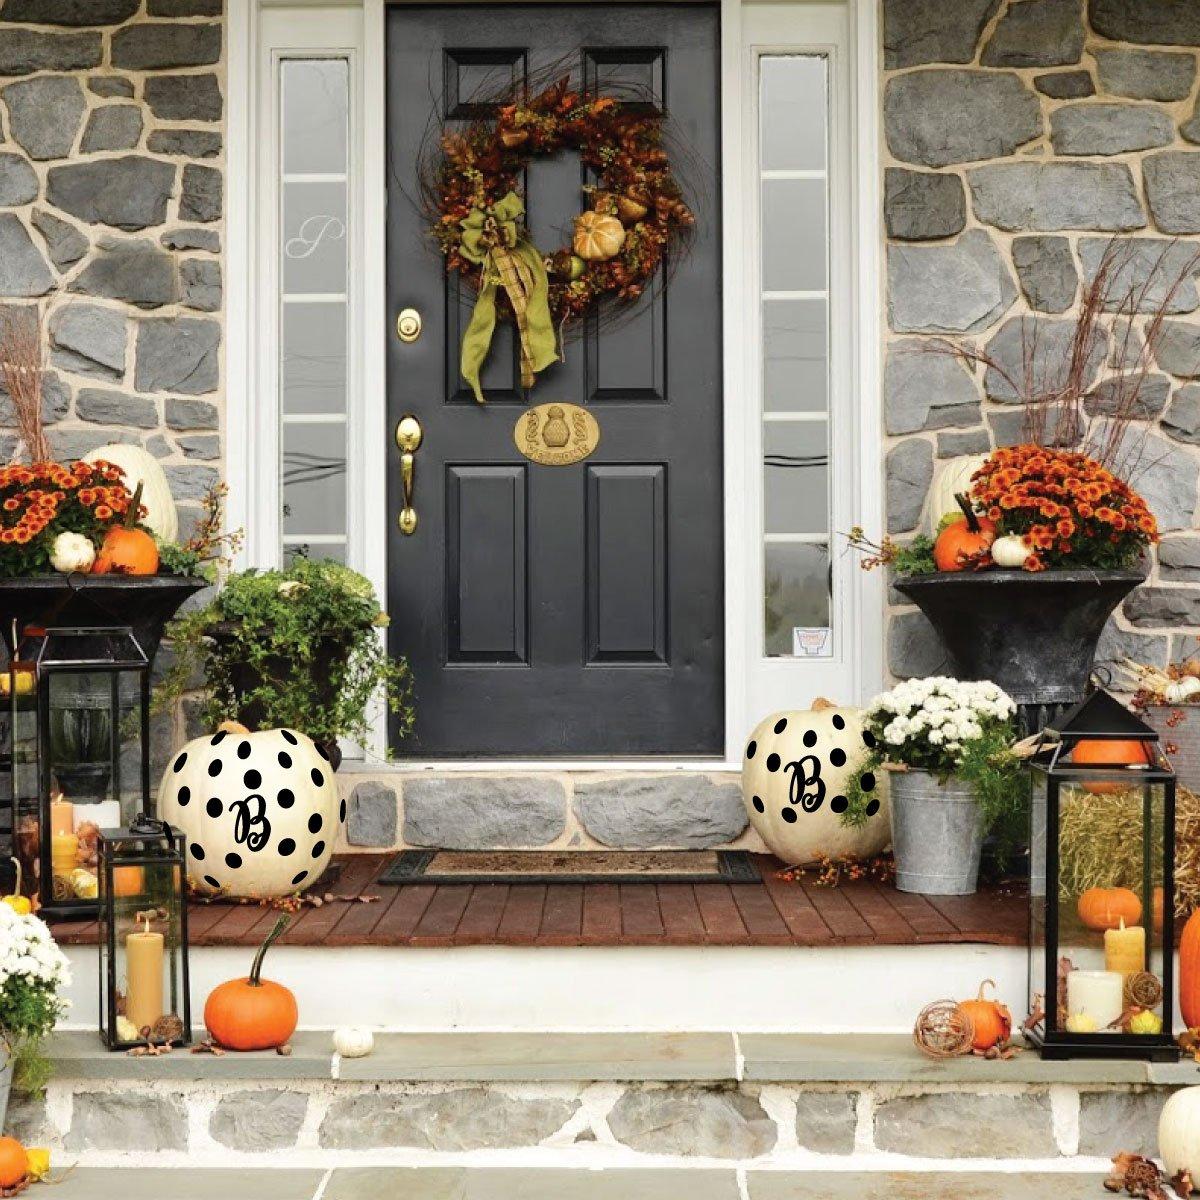 2 Sets Black Letter B Polks Dots Decorating Jack-O-Lanterns Pumpkins Fall Decor Vinyl Decals Halloween Decorations Party Favors